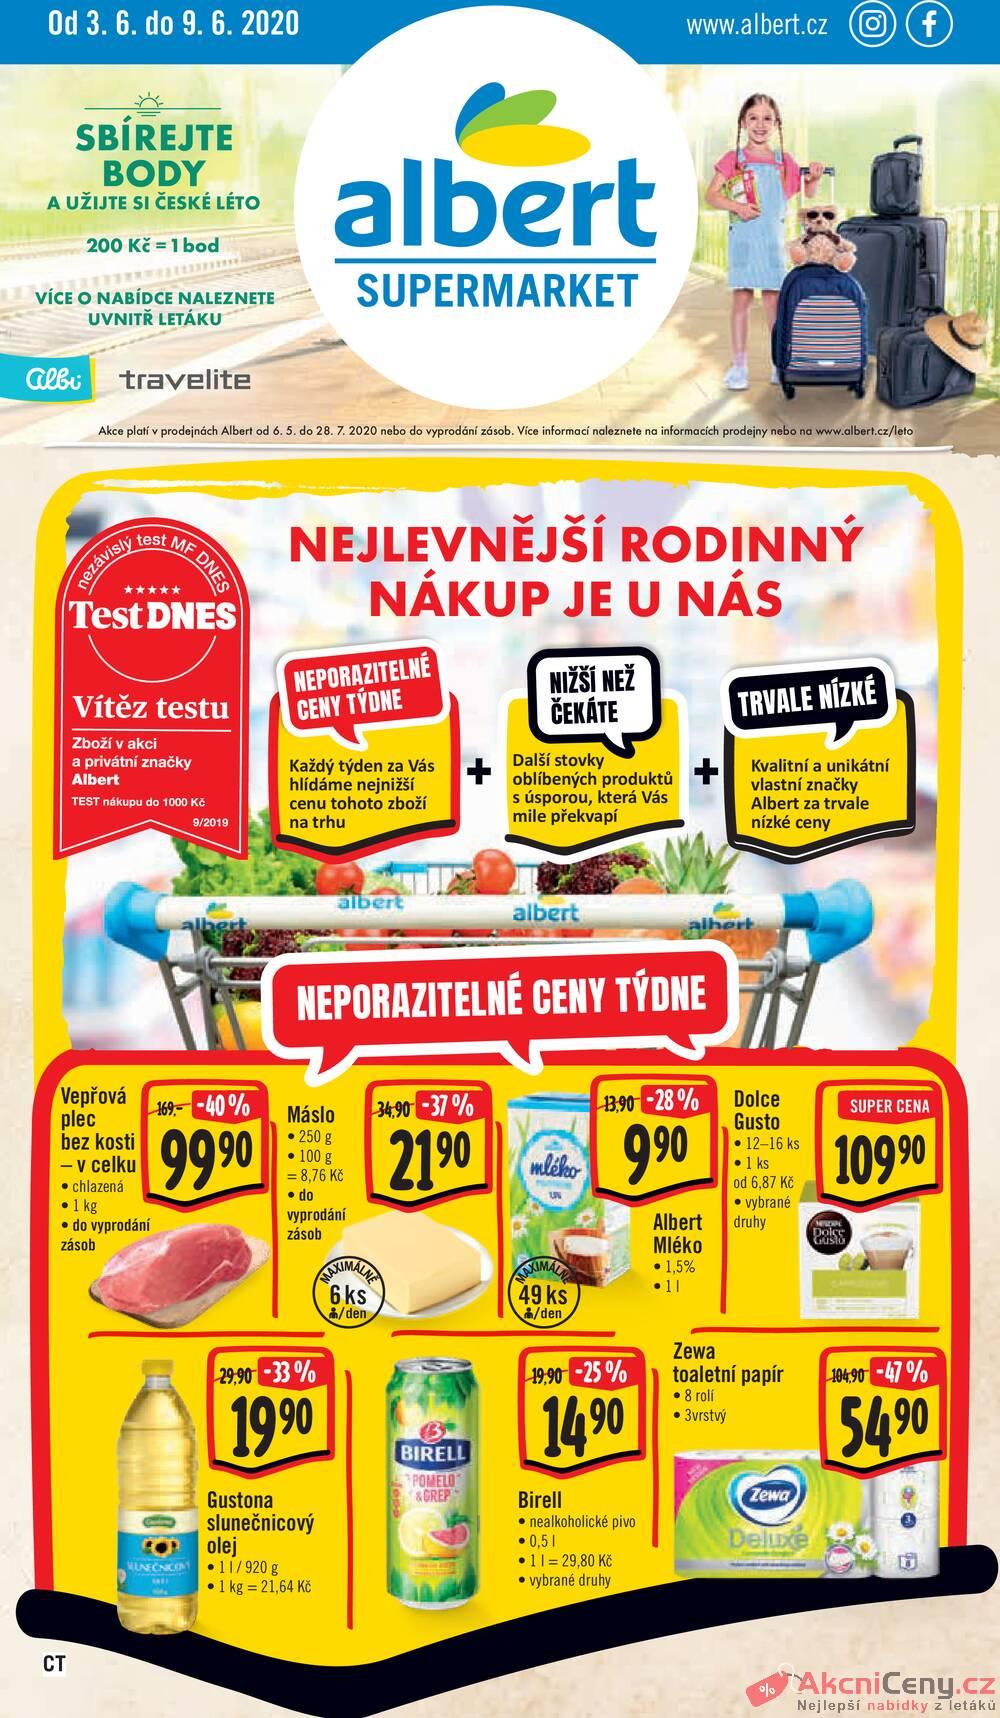 Albert Supermarket CITY od 3.6. do 9.6.2020